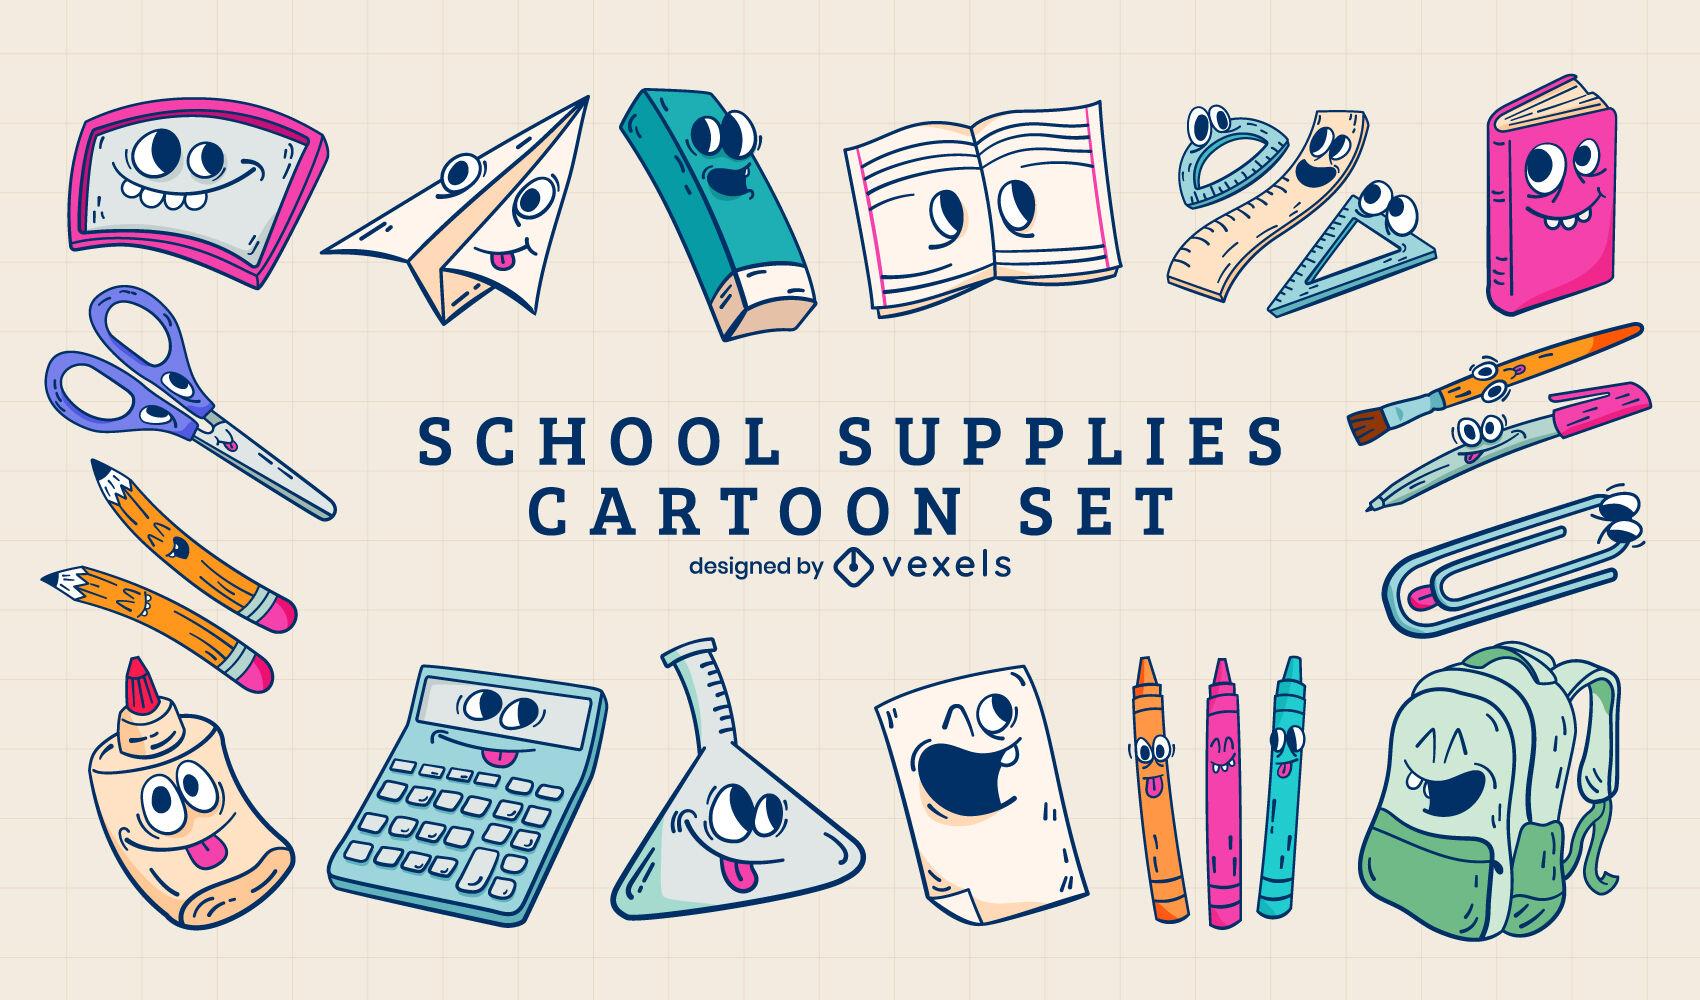 School supplies cartoon set